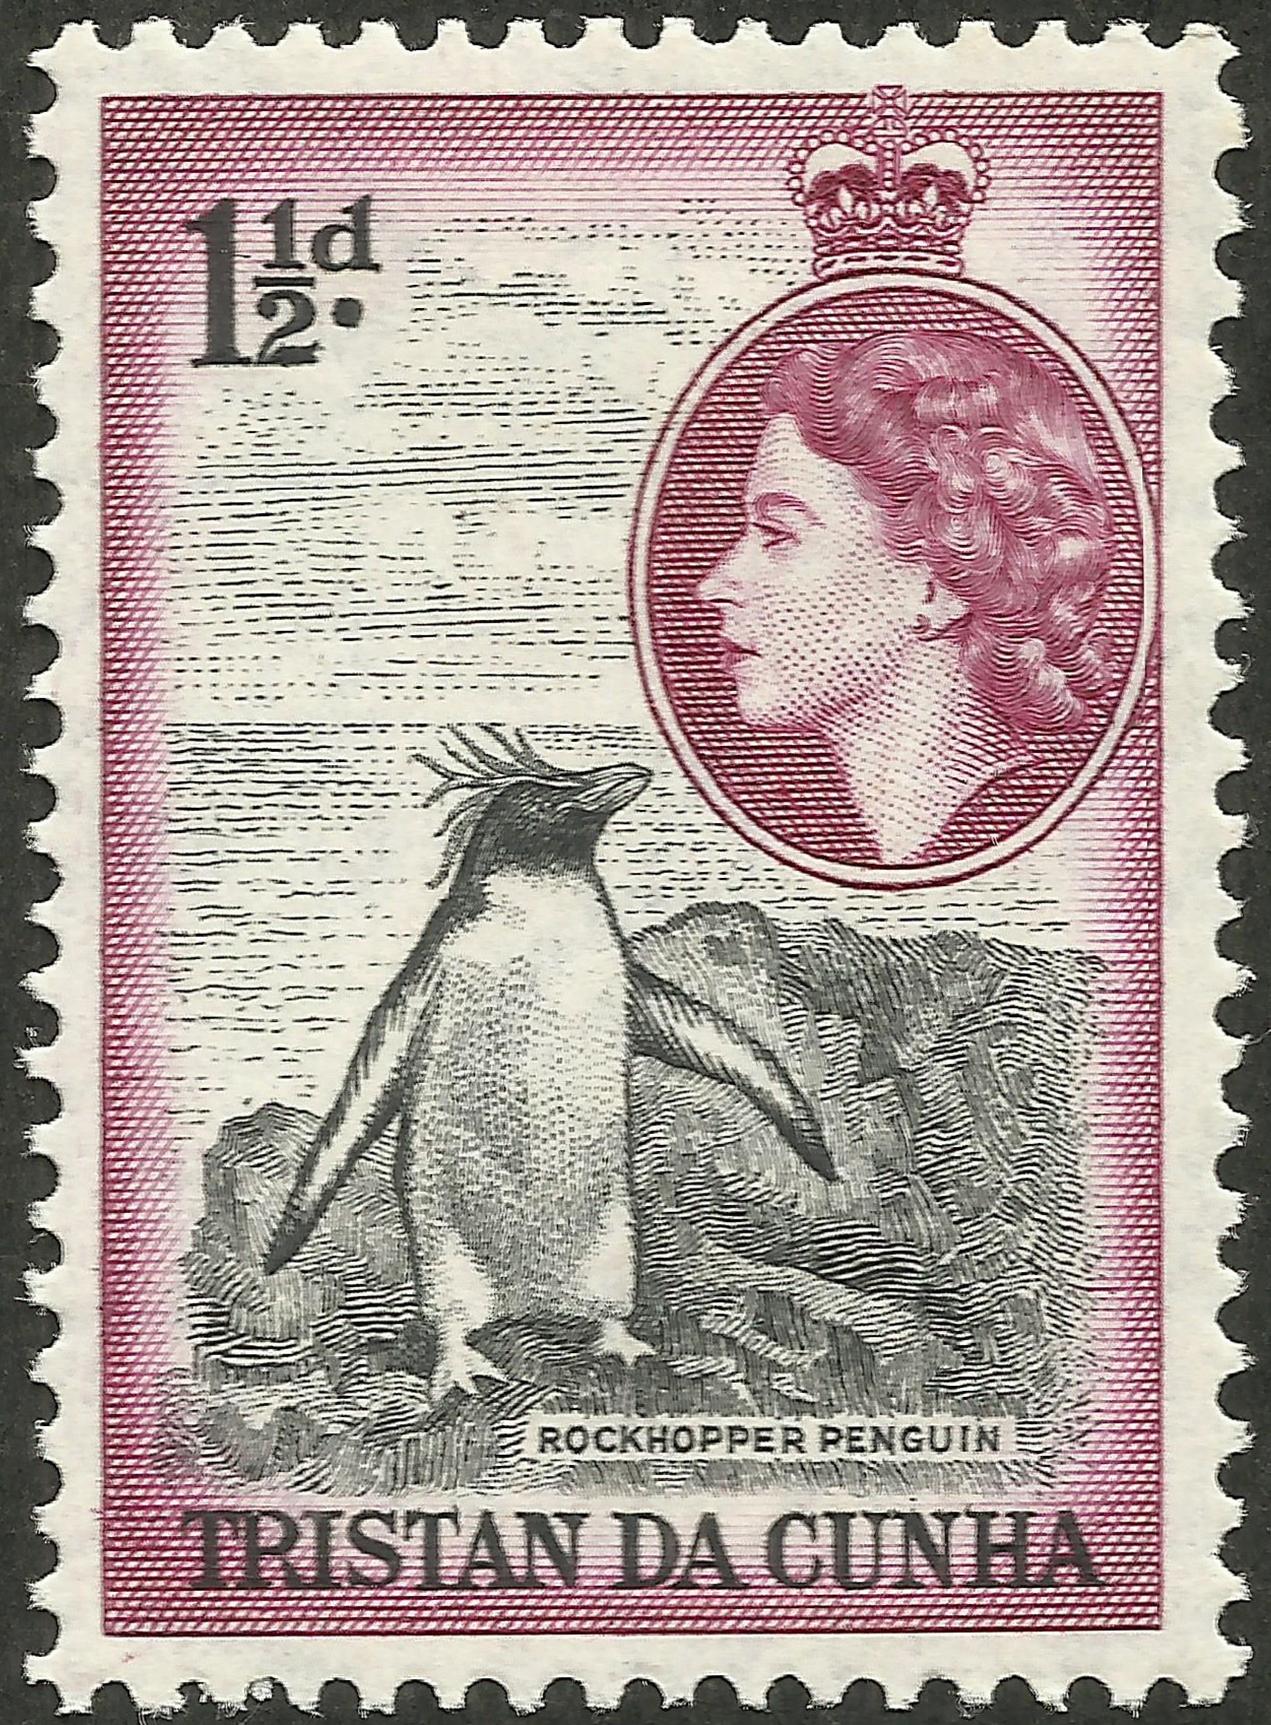 Tristan da Cunha #16 (1954)